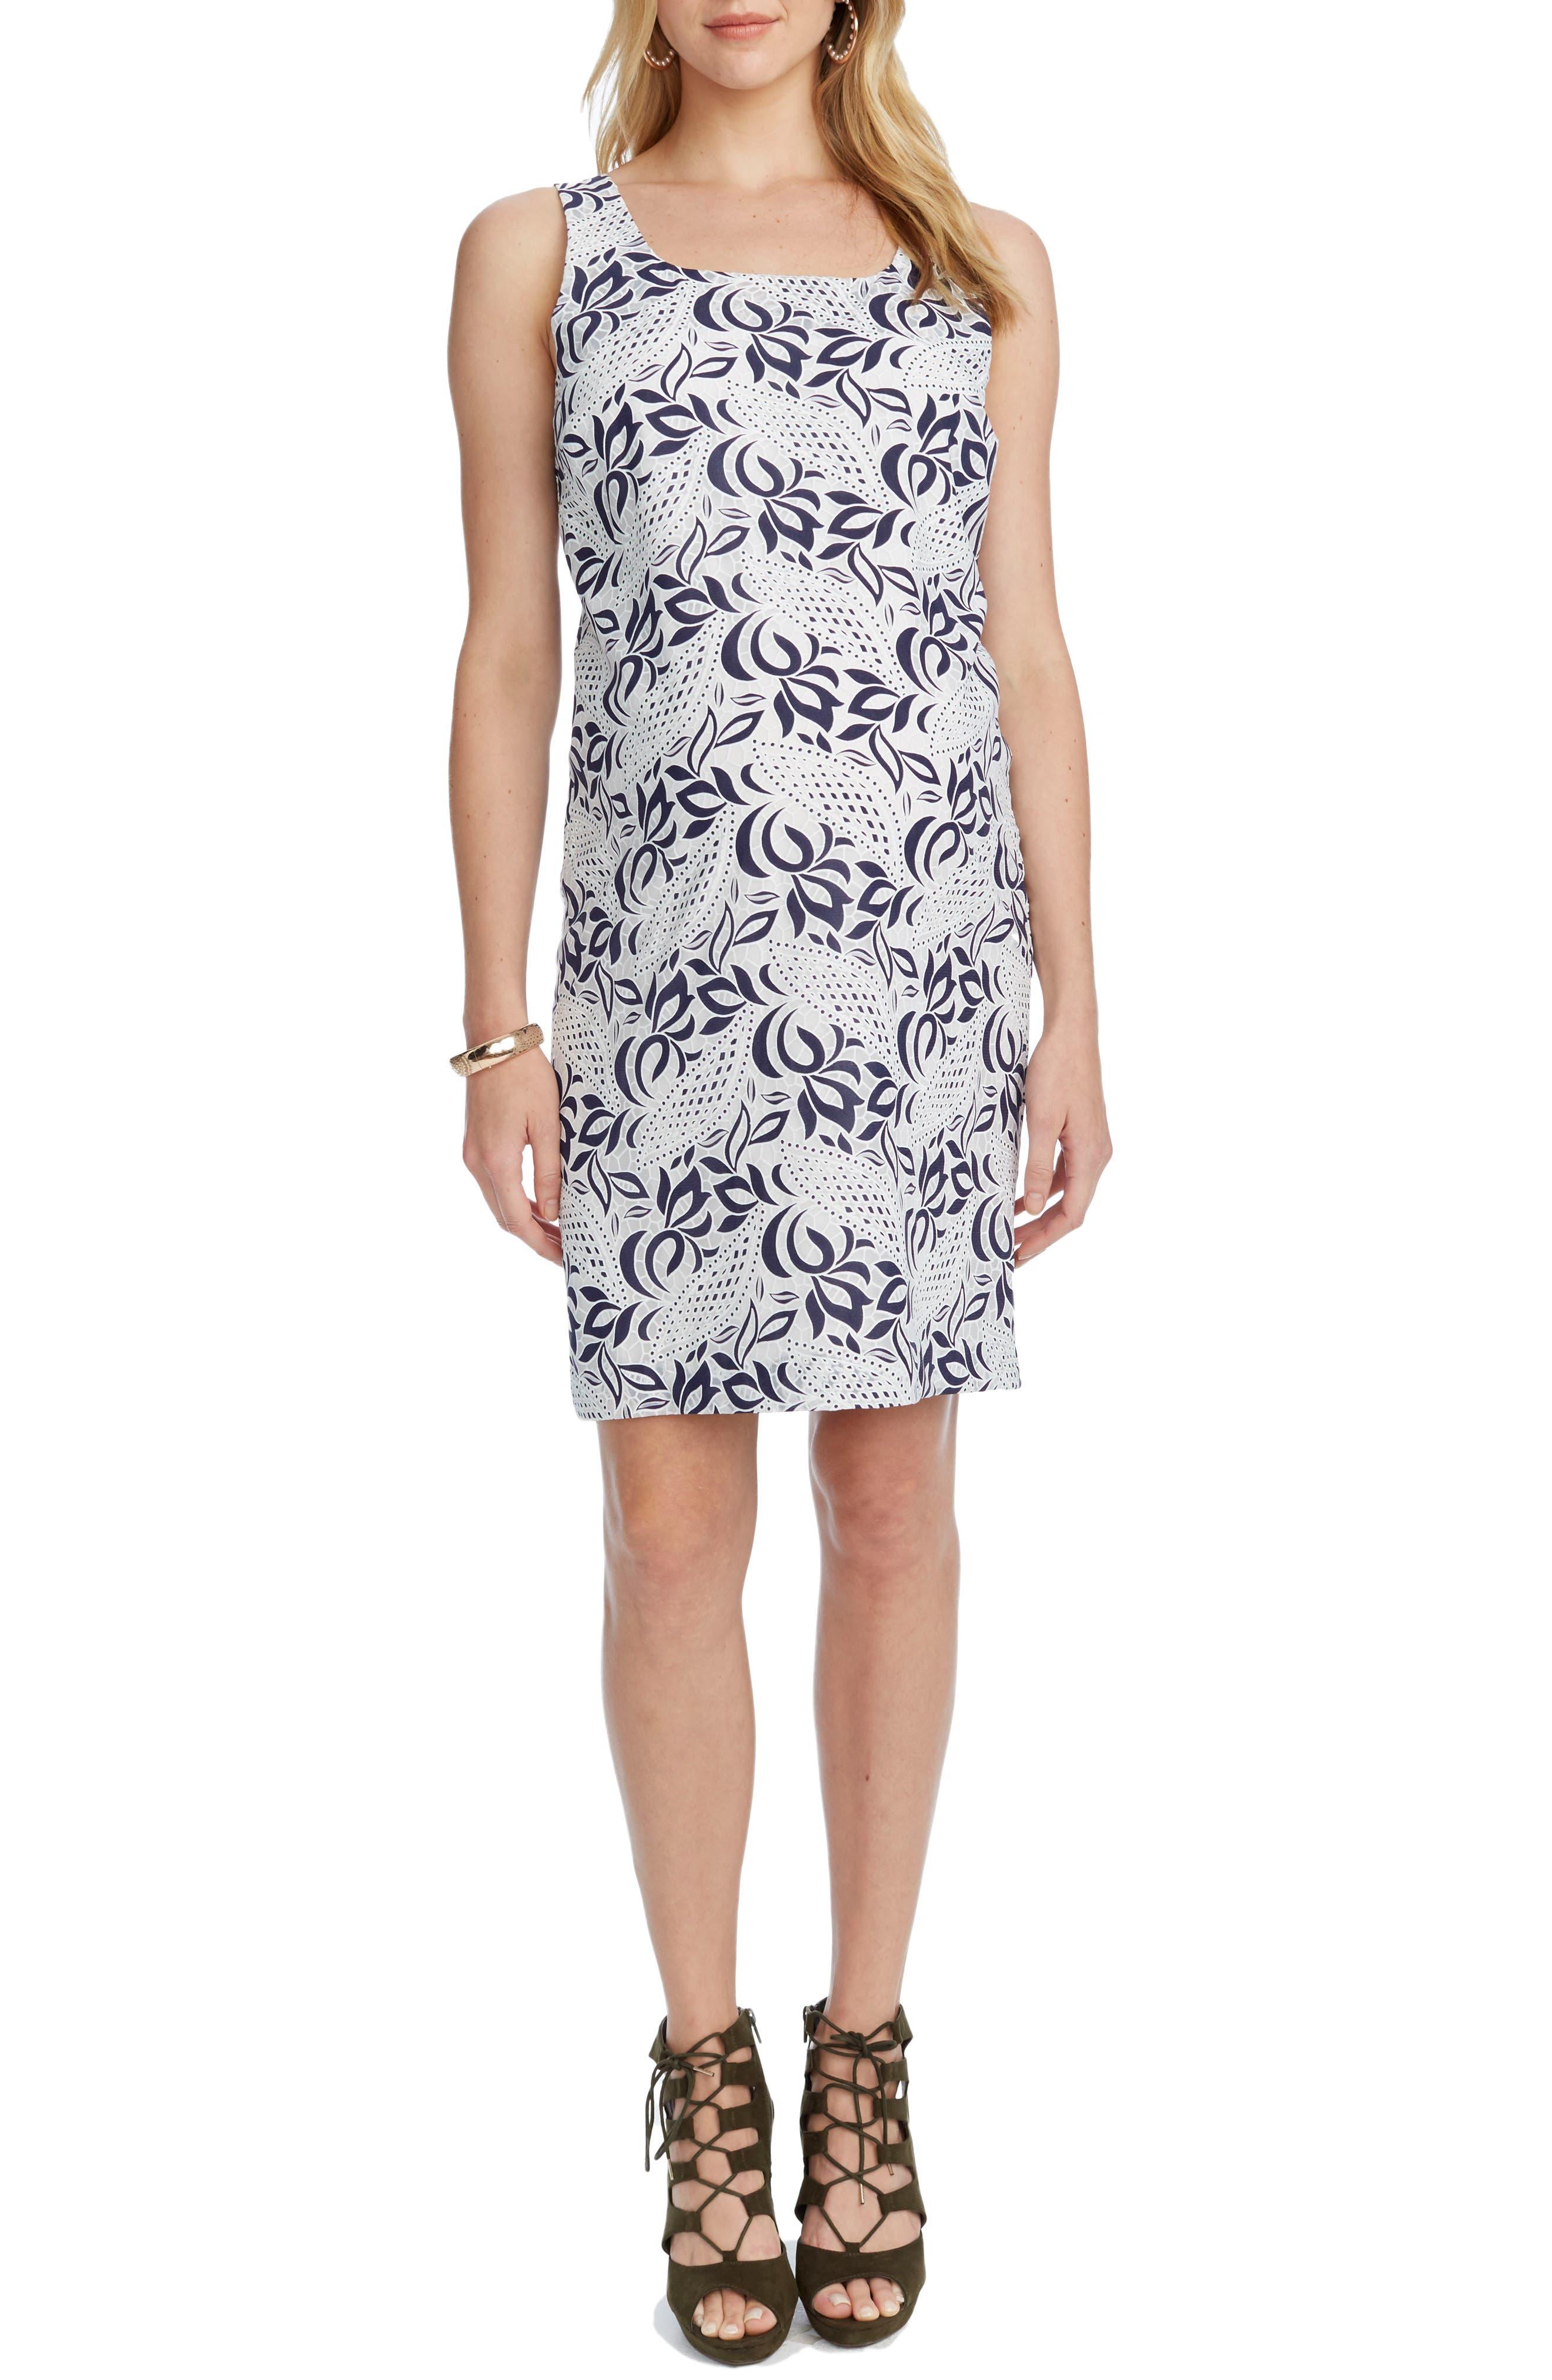 'Victoria' Lace Sleeveless Maternity Dress,                         Main,                         color, NAVY/ WHITE